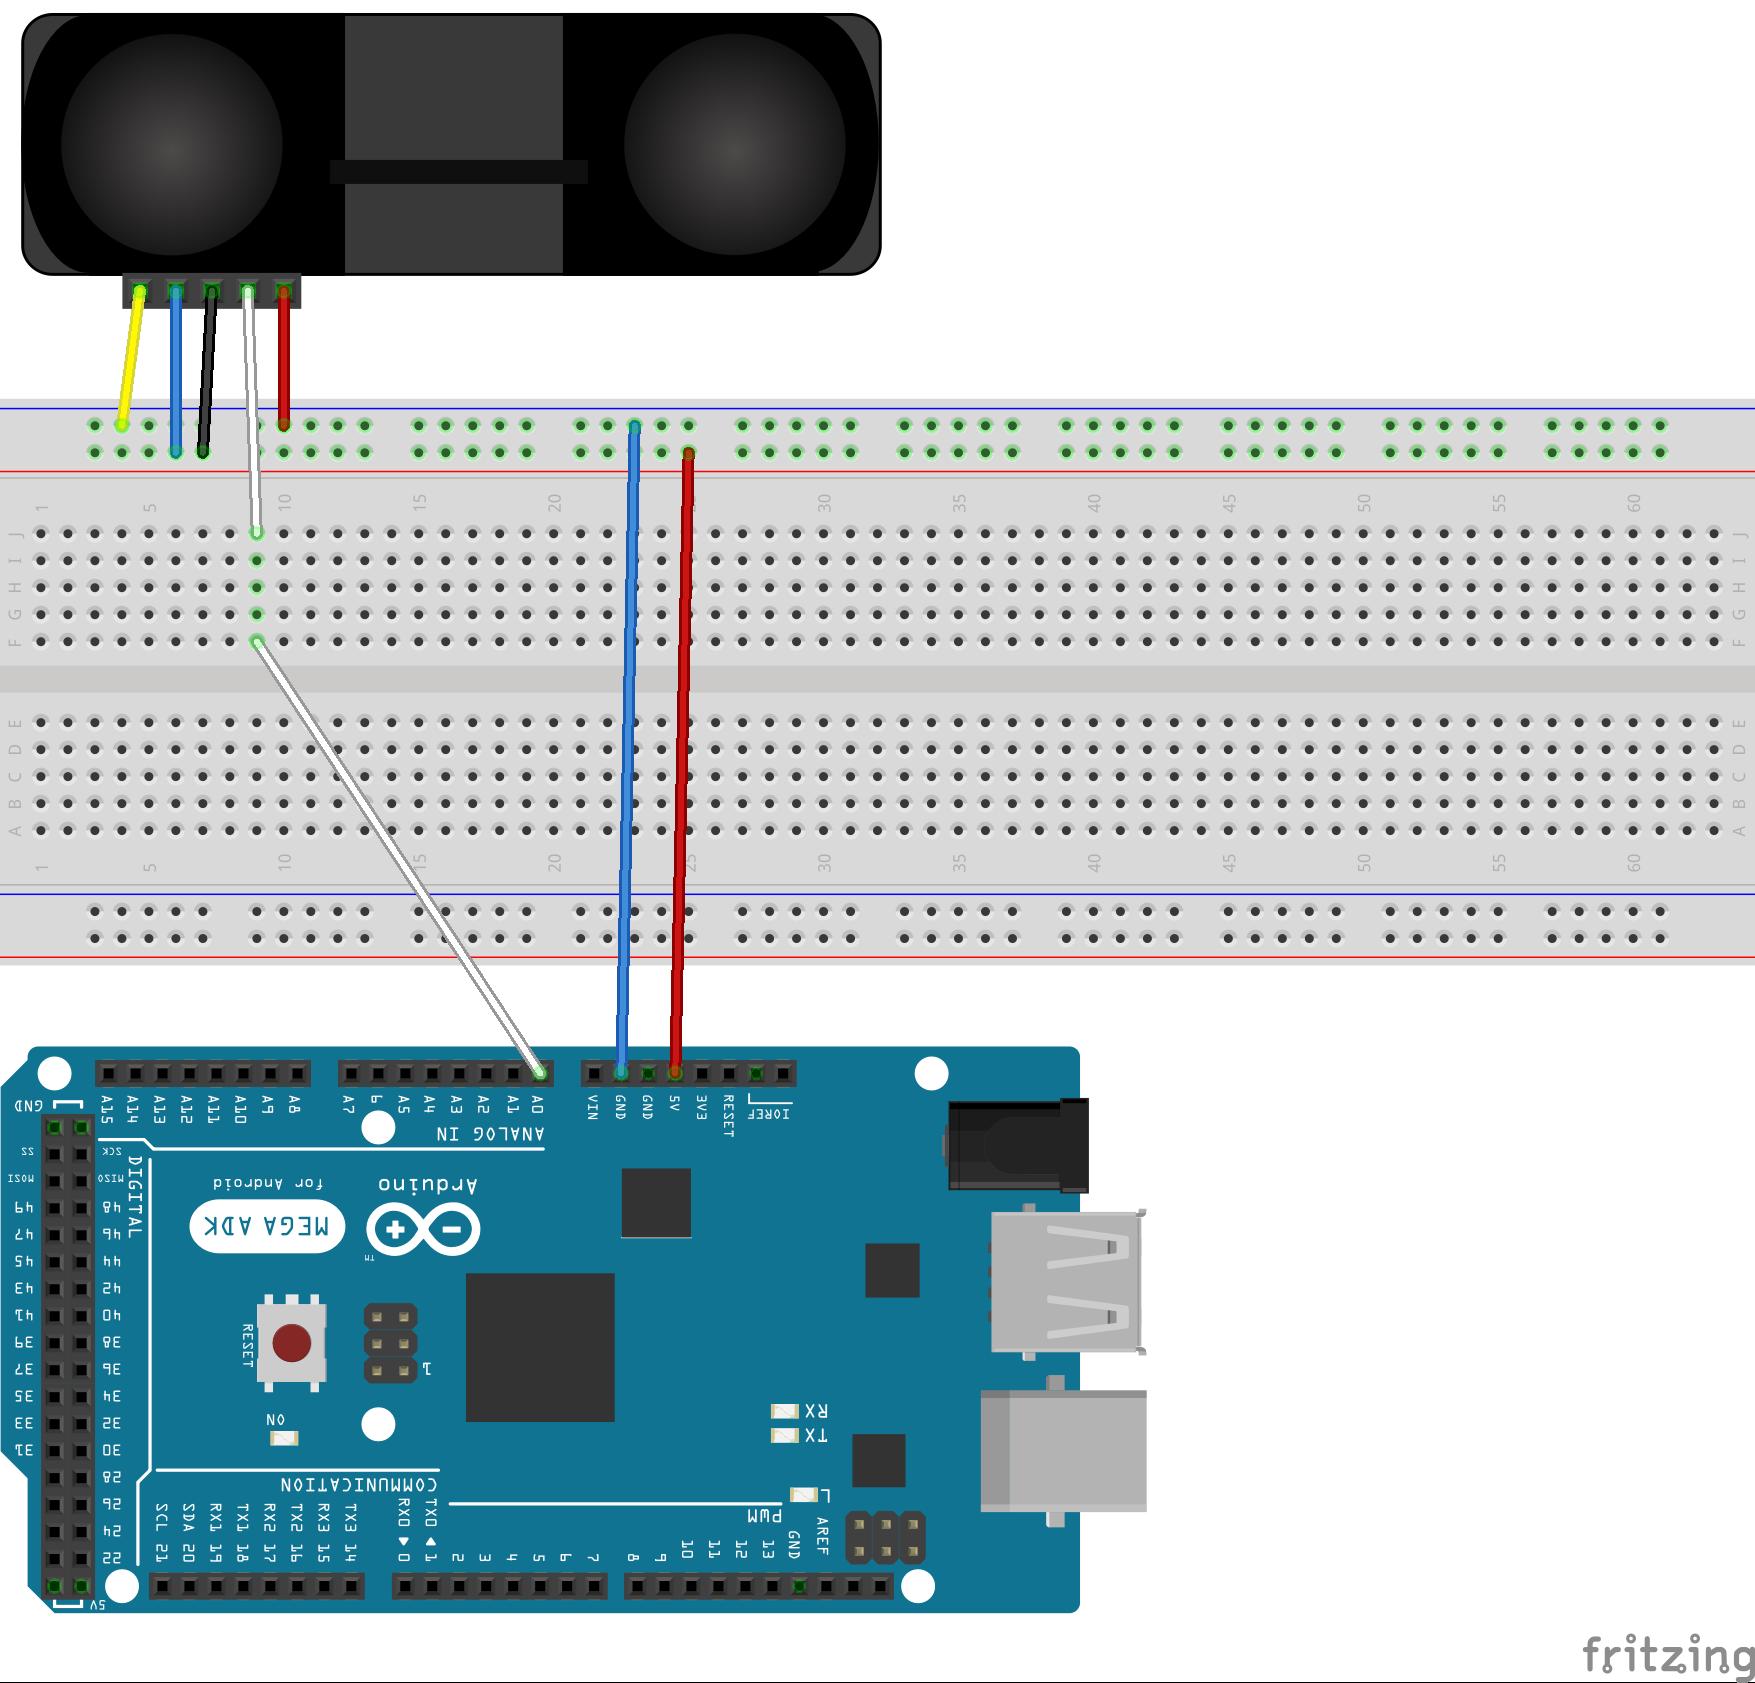 GP2Y0A710K0Fブレッドボード接続図